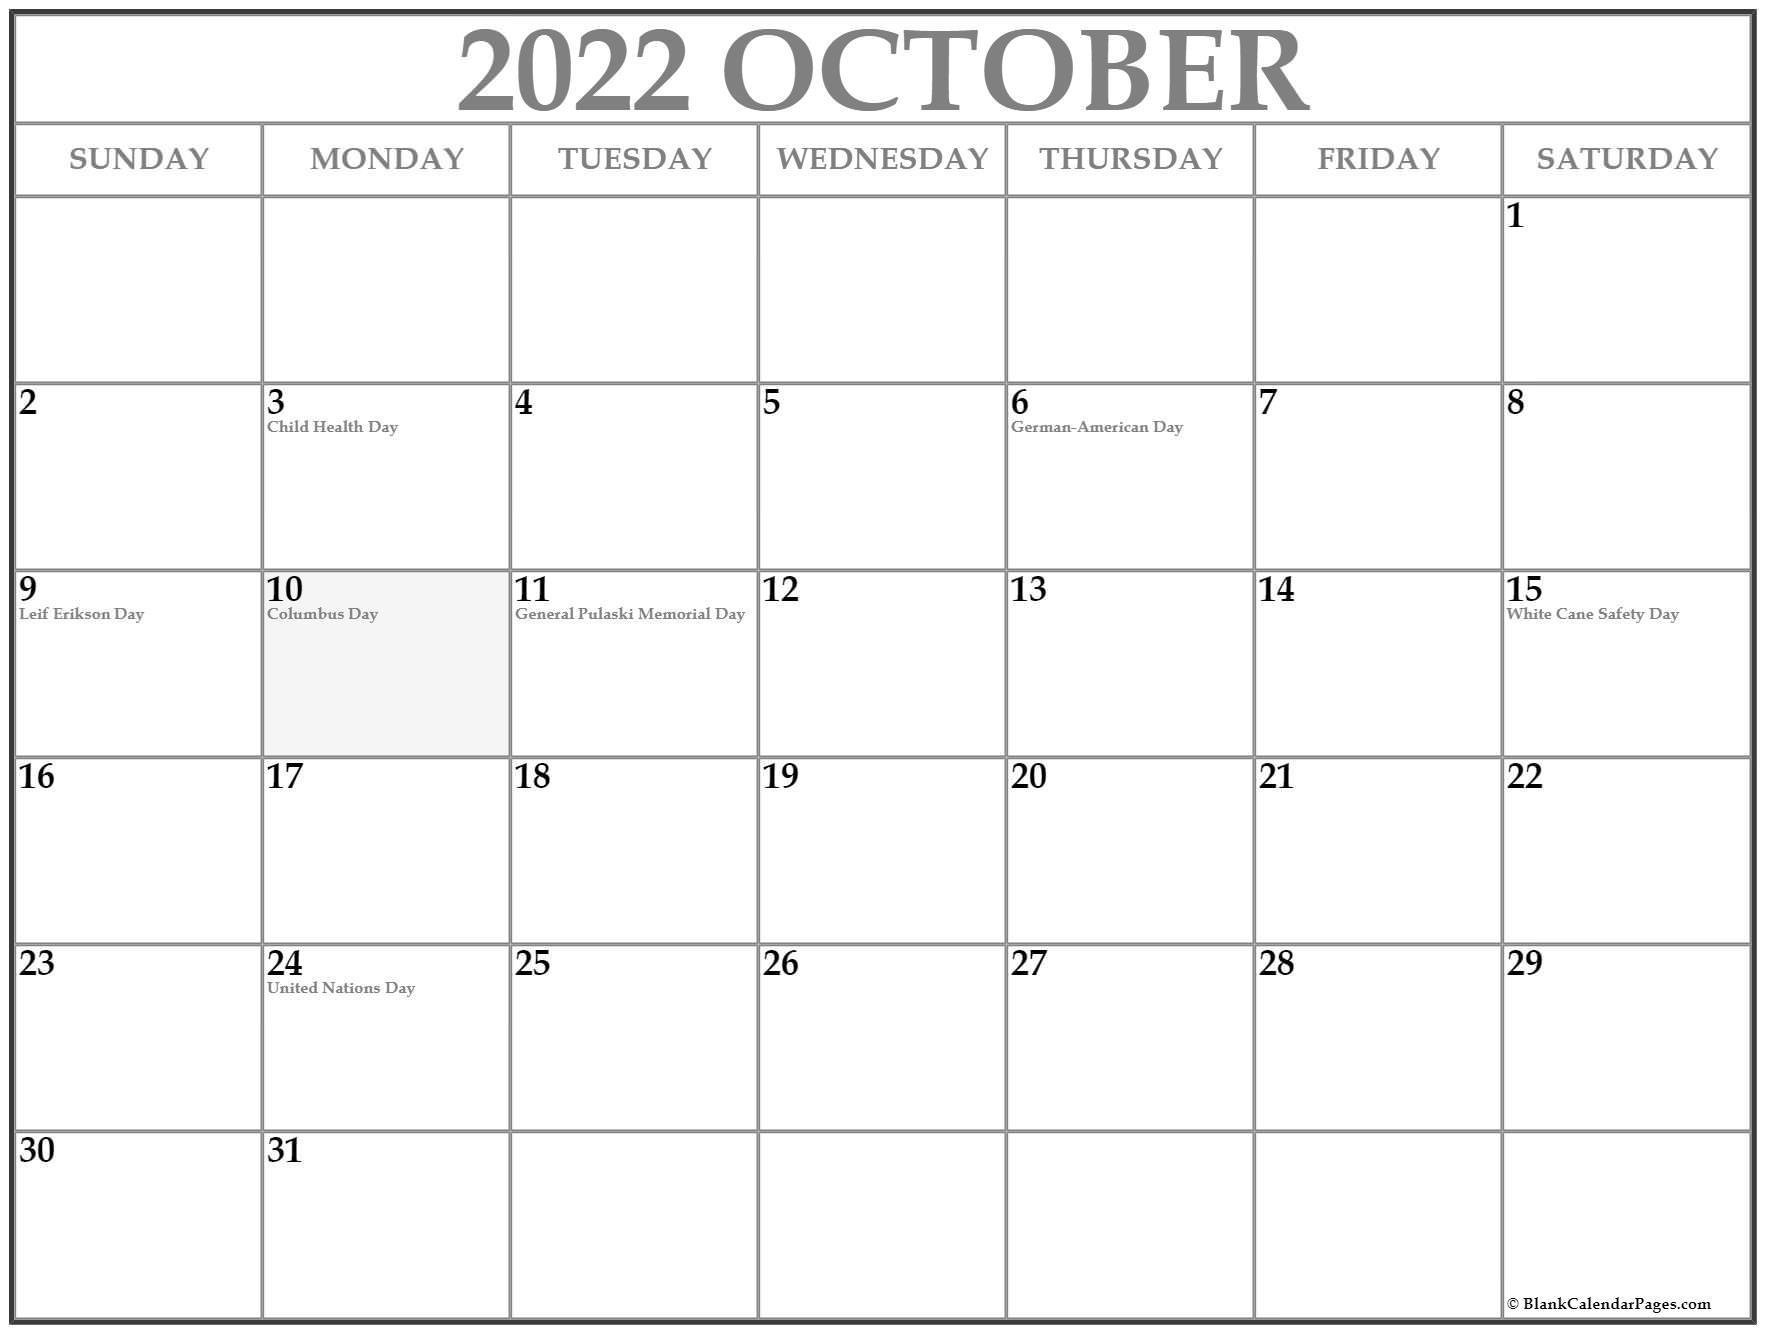 October calendar USA